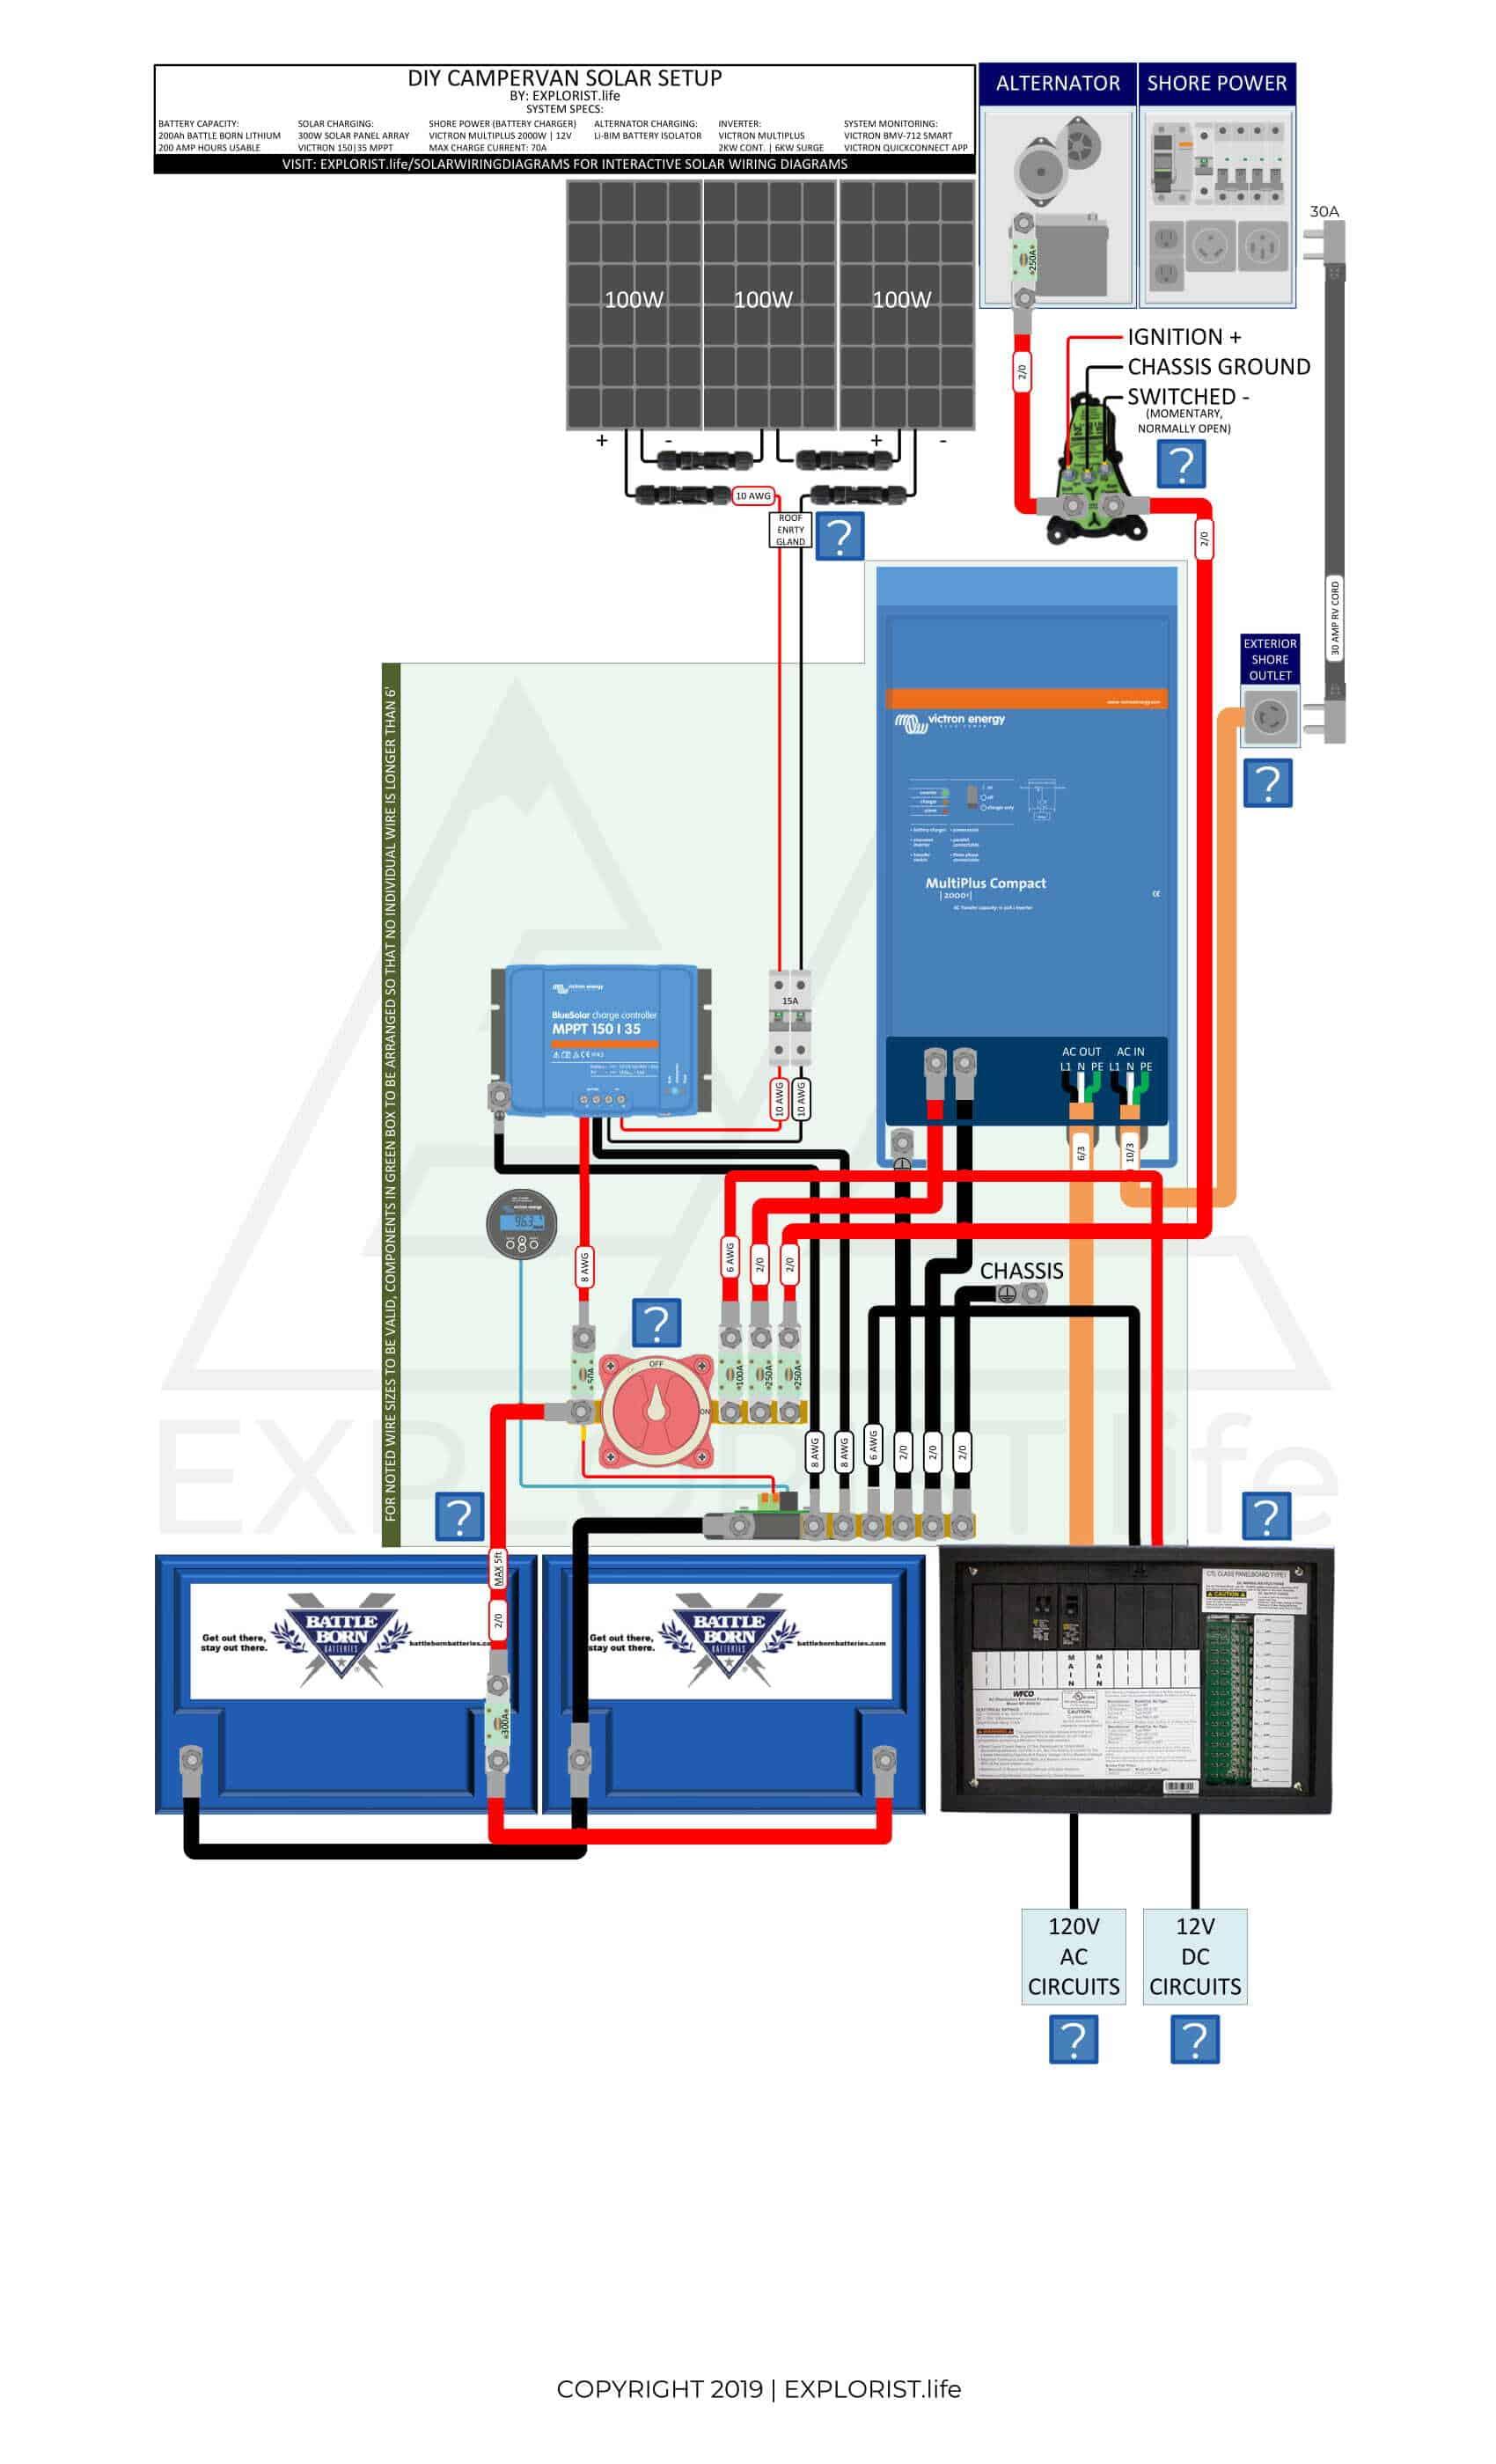 200Ah Lithium Battery Bank – 3x100W Solar – 2kW Inverter/Charger – Li-BIM Alternator Charging